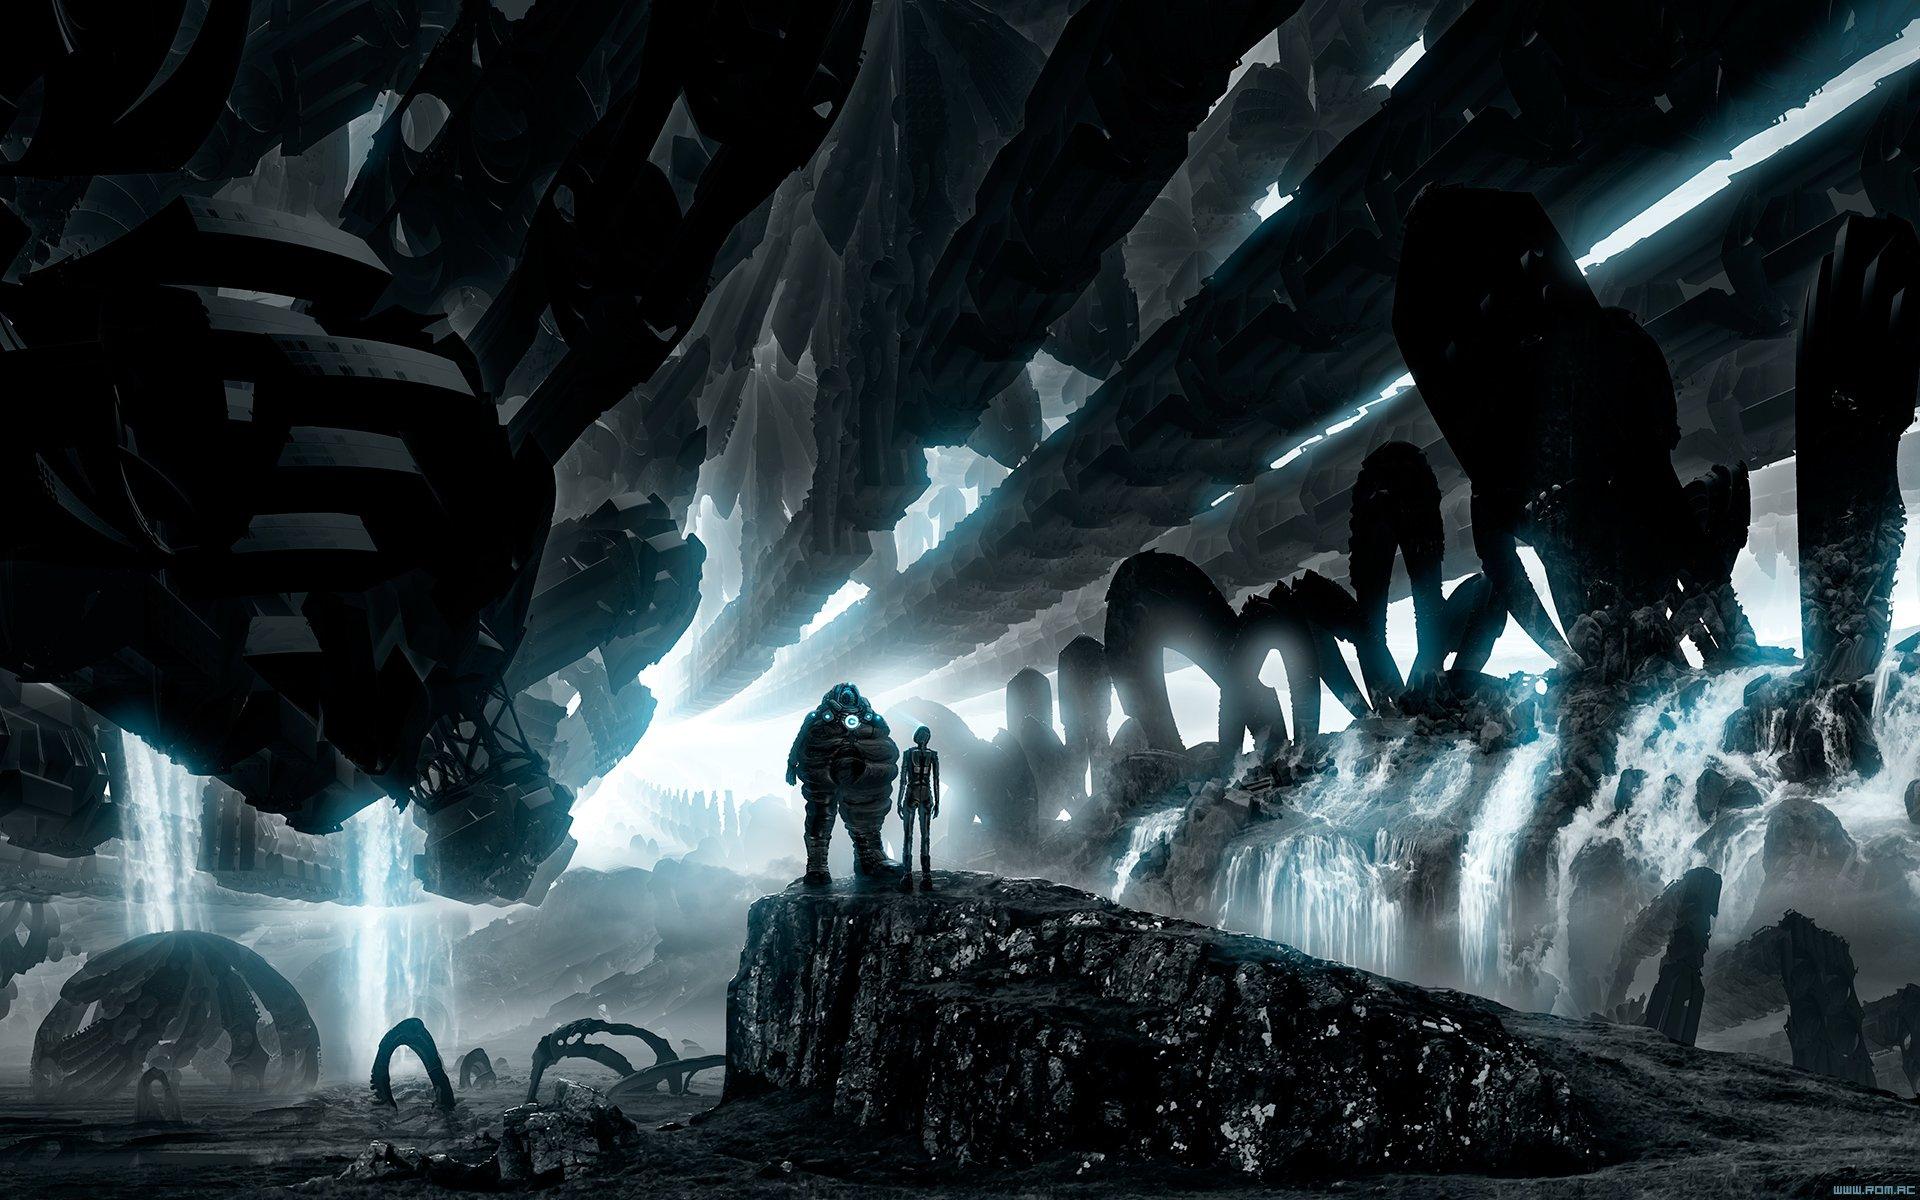 Comics - Romantically Apocalyptic  Wallpaper